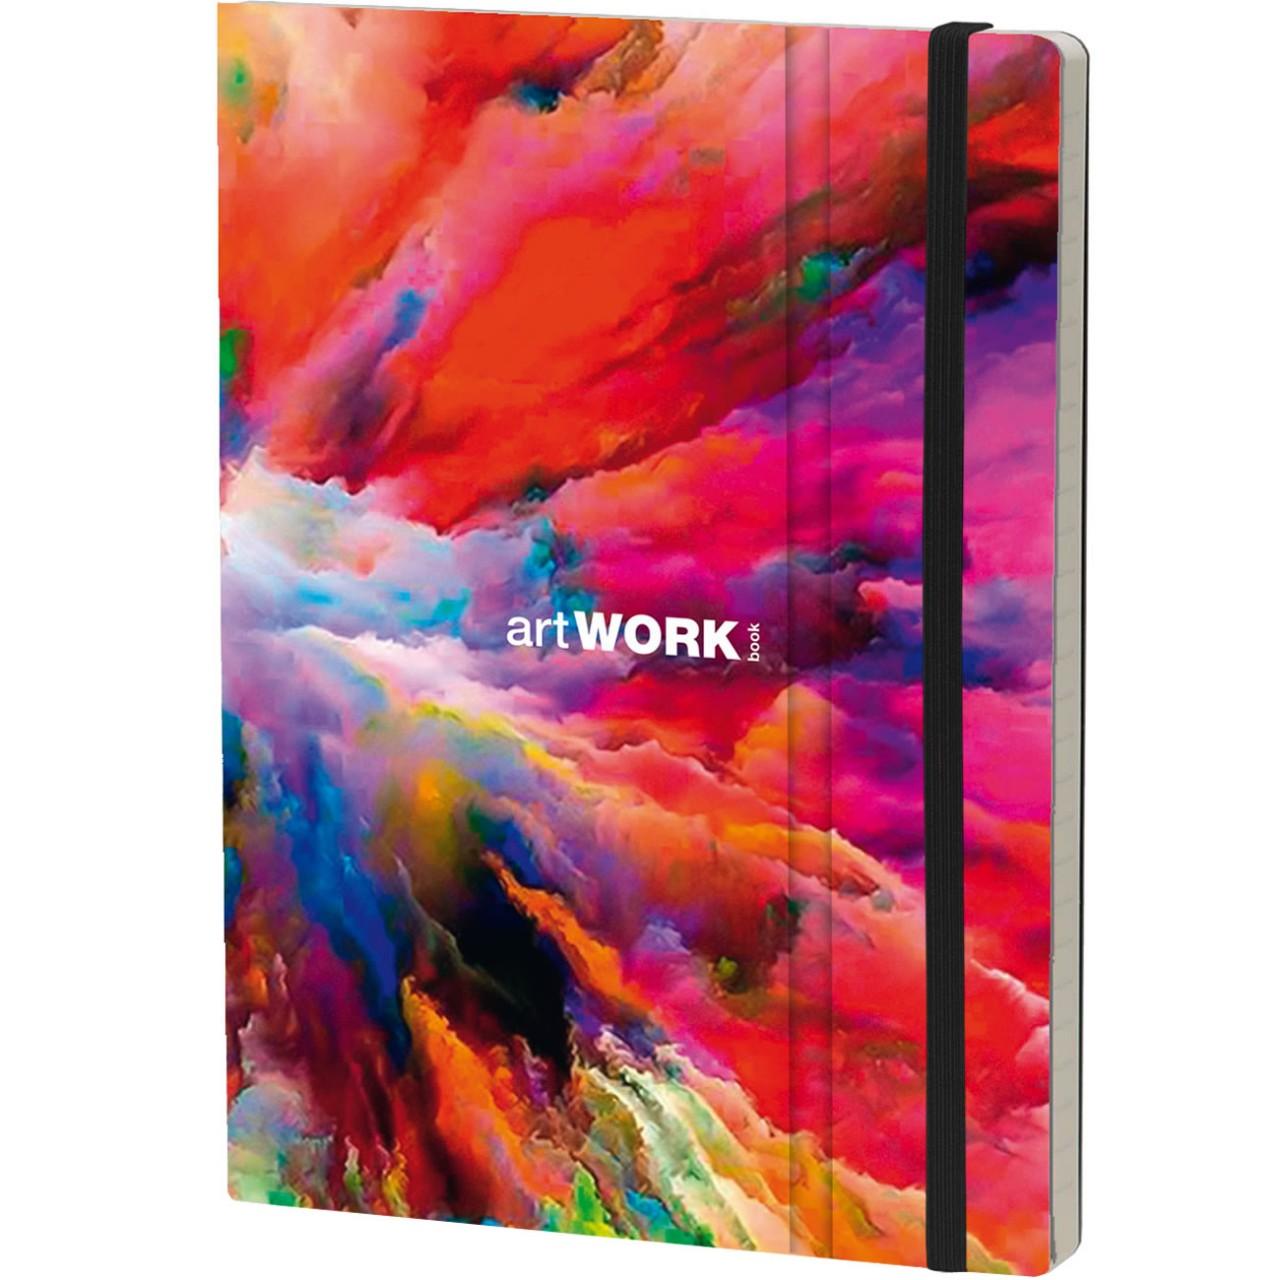 Stifflex Notizbuch ARTWORK BOOK 15 x 21 cm 192 S., CLOUD SPLASH